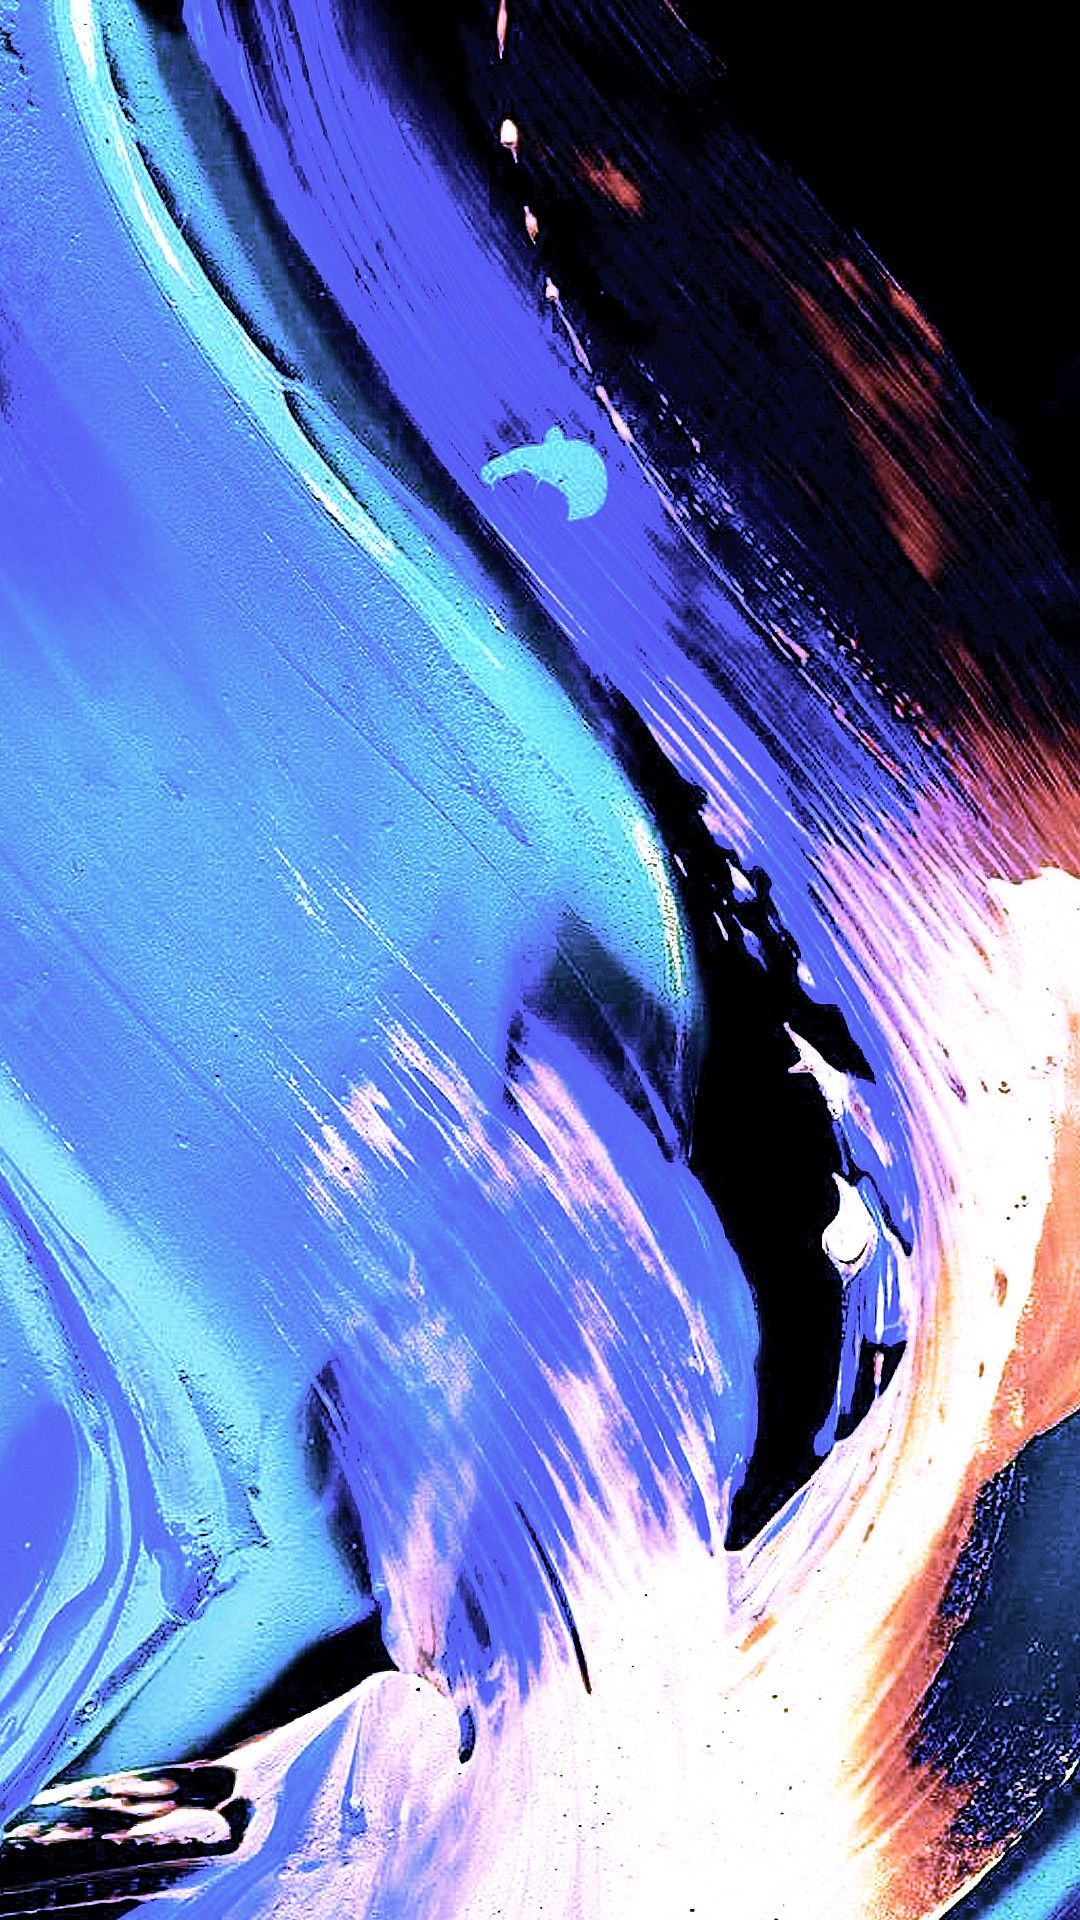 Pin by Iyan Sofyan on Abstract °Amoled °Liquid °Gradient